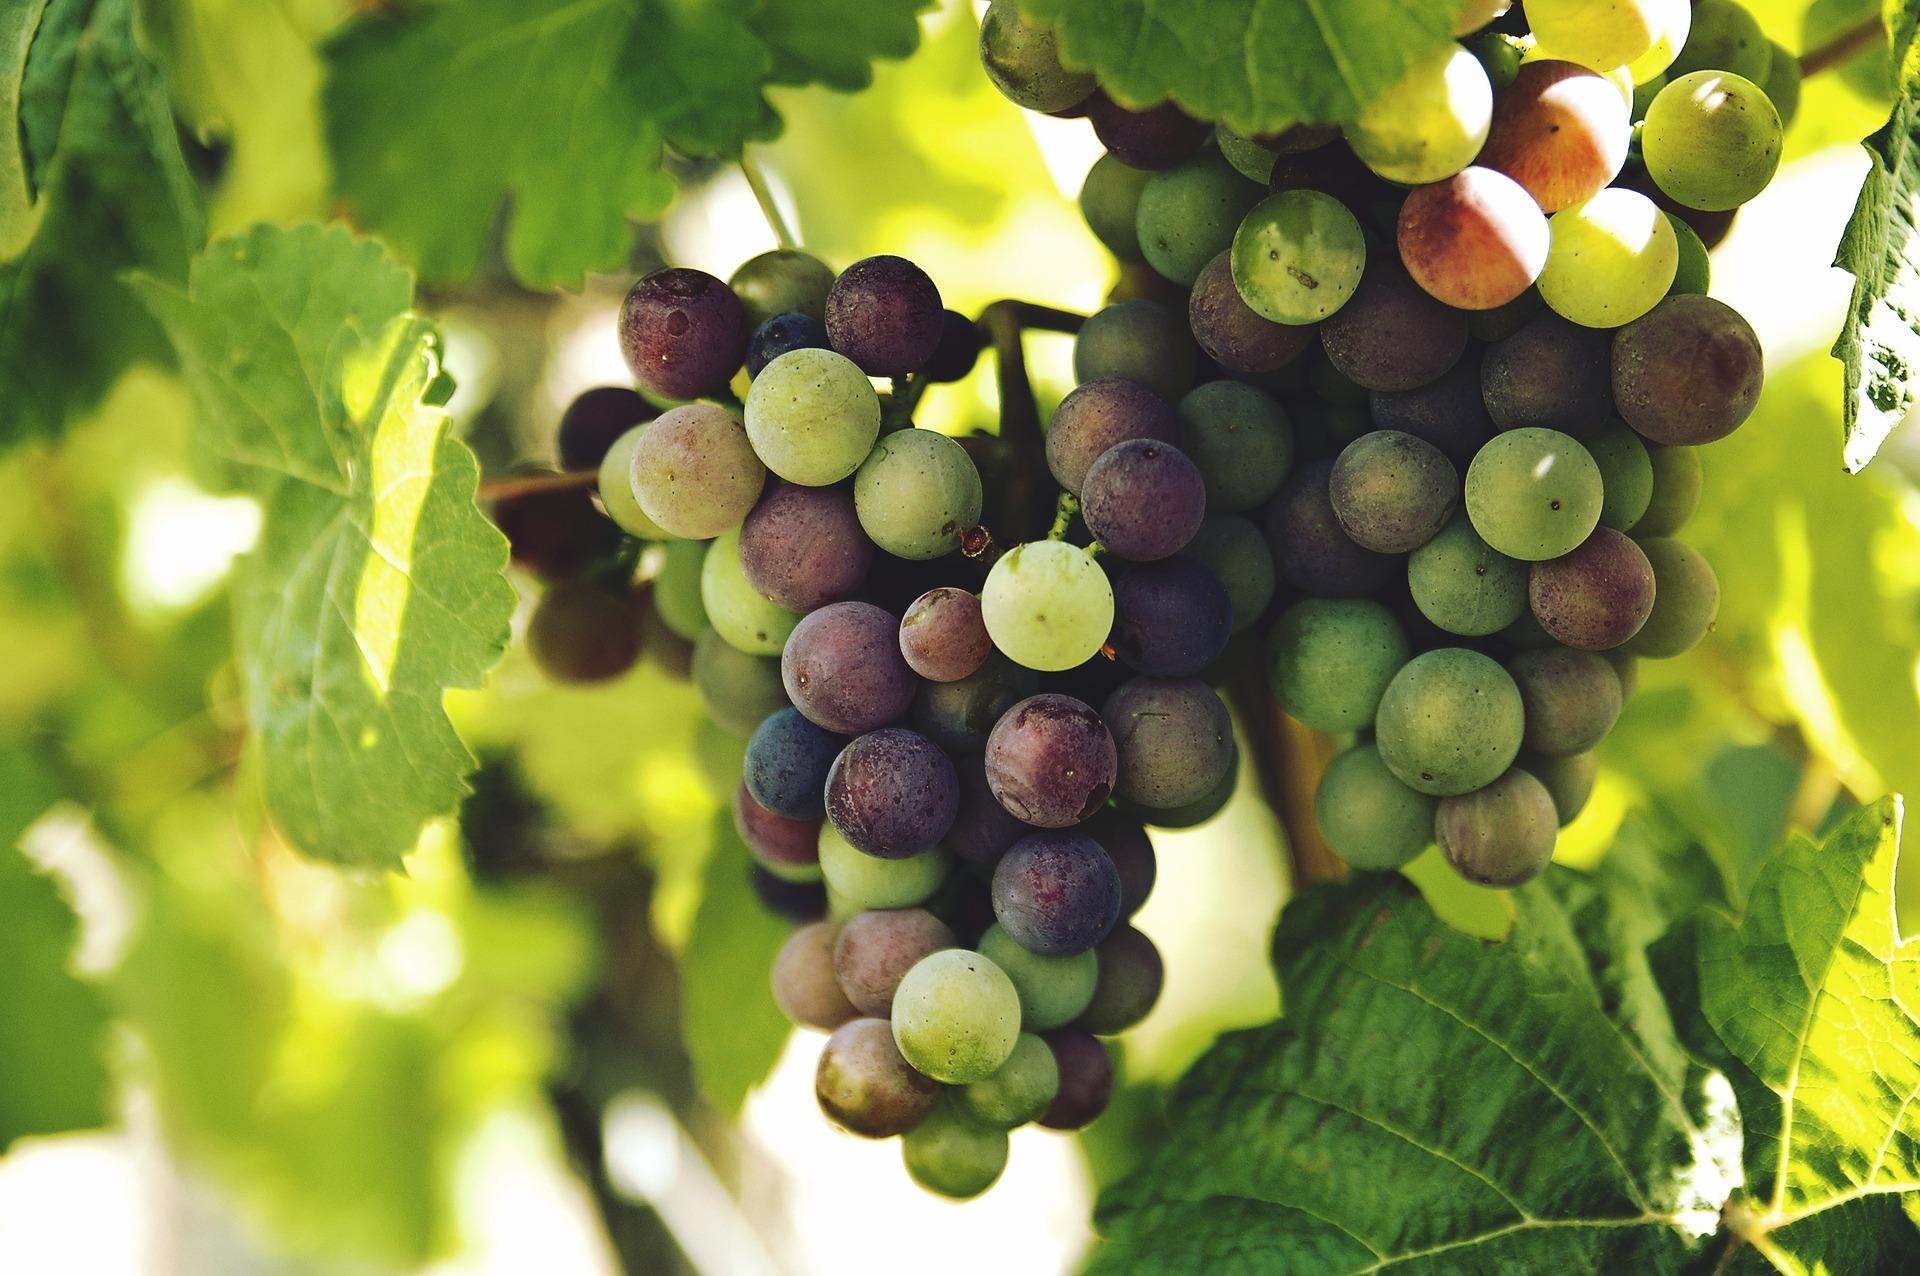 grapes 1246531 1920